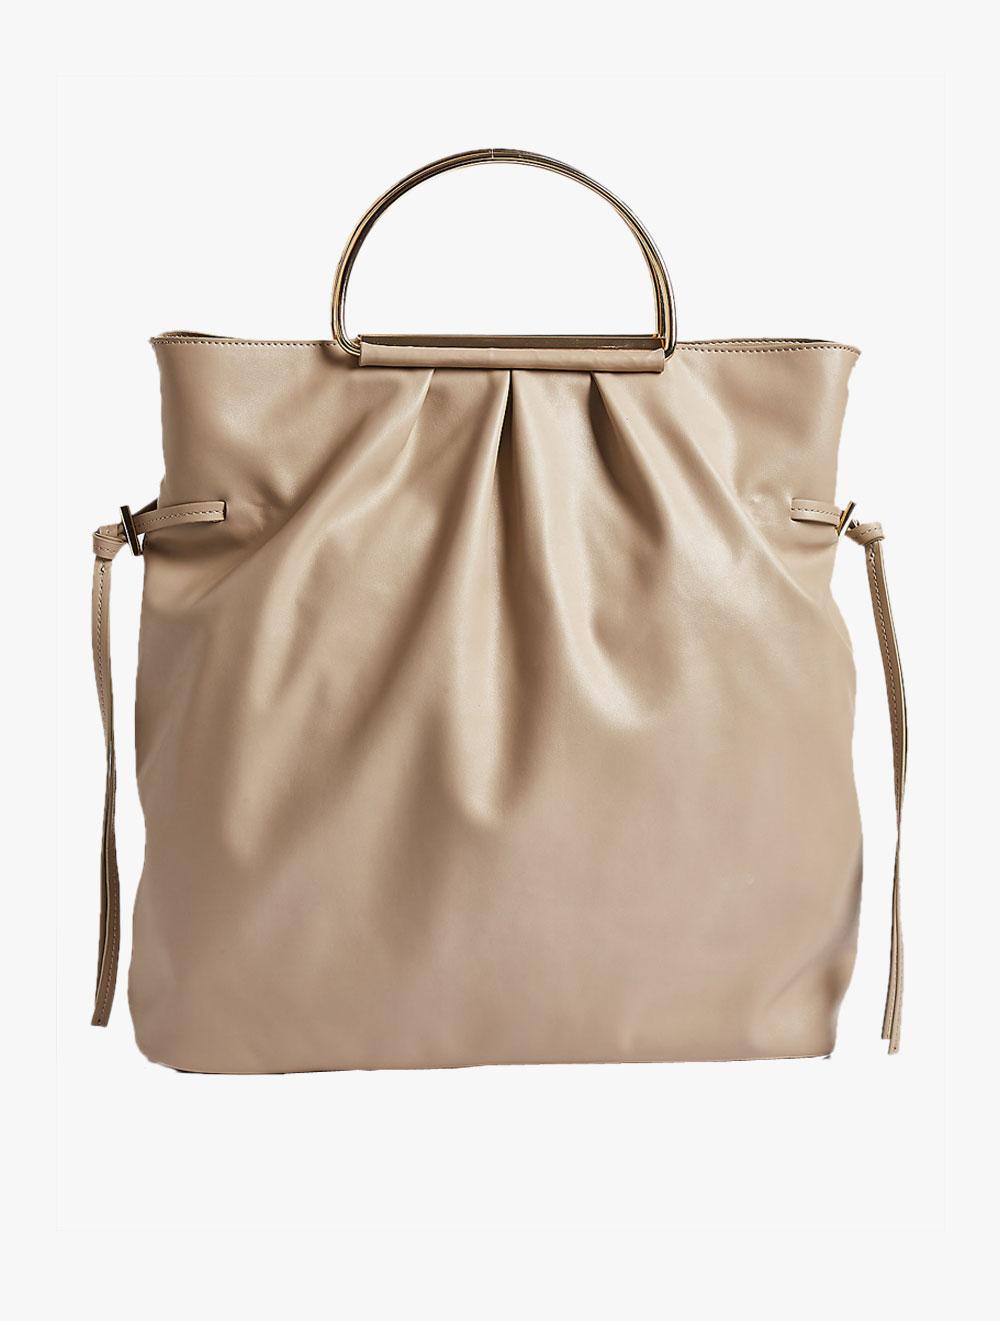 Online Shopping International Lifestyle Branded Product Tas Wanita Hand Bag Sc2337 Buy Now